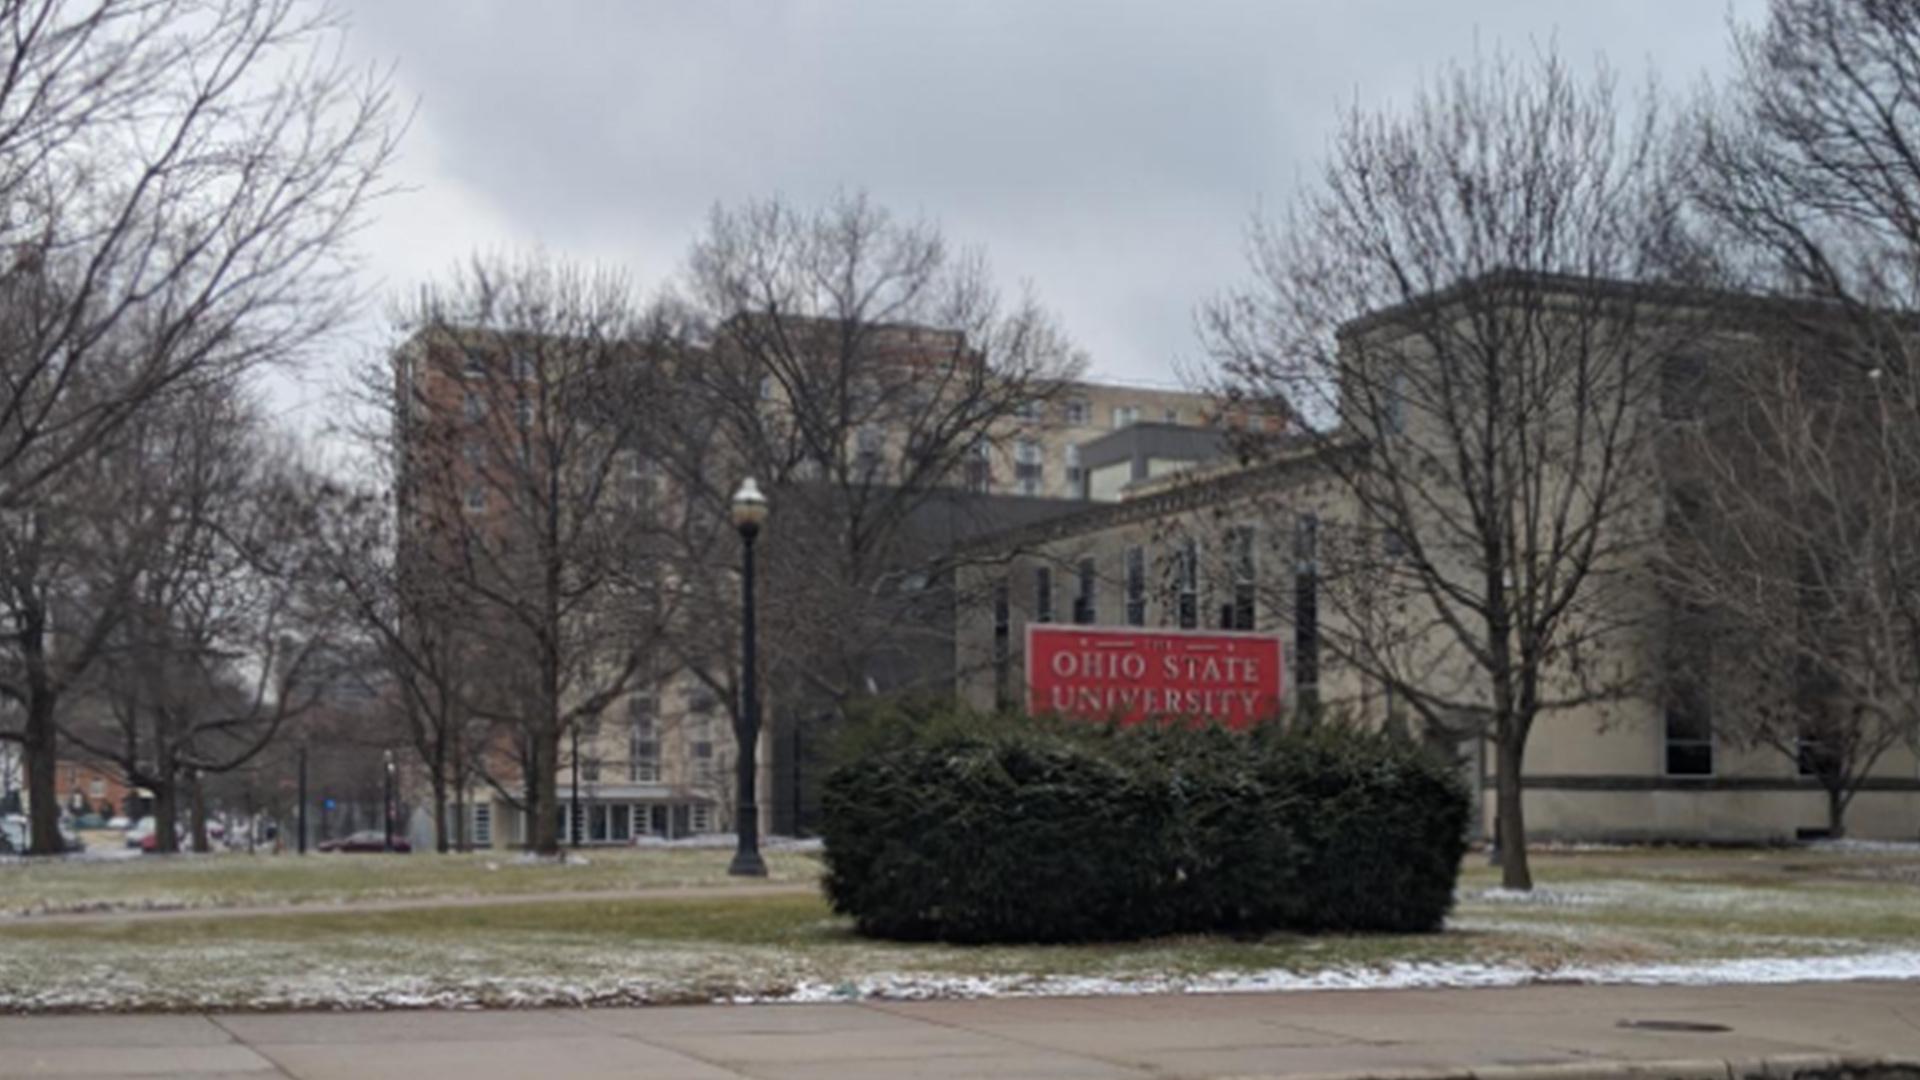 the ohio state university osu buckeyes file photo1_1550518687898.jpg.jpg